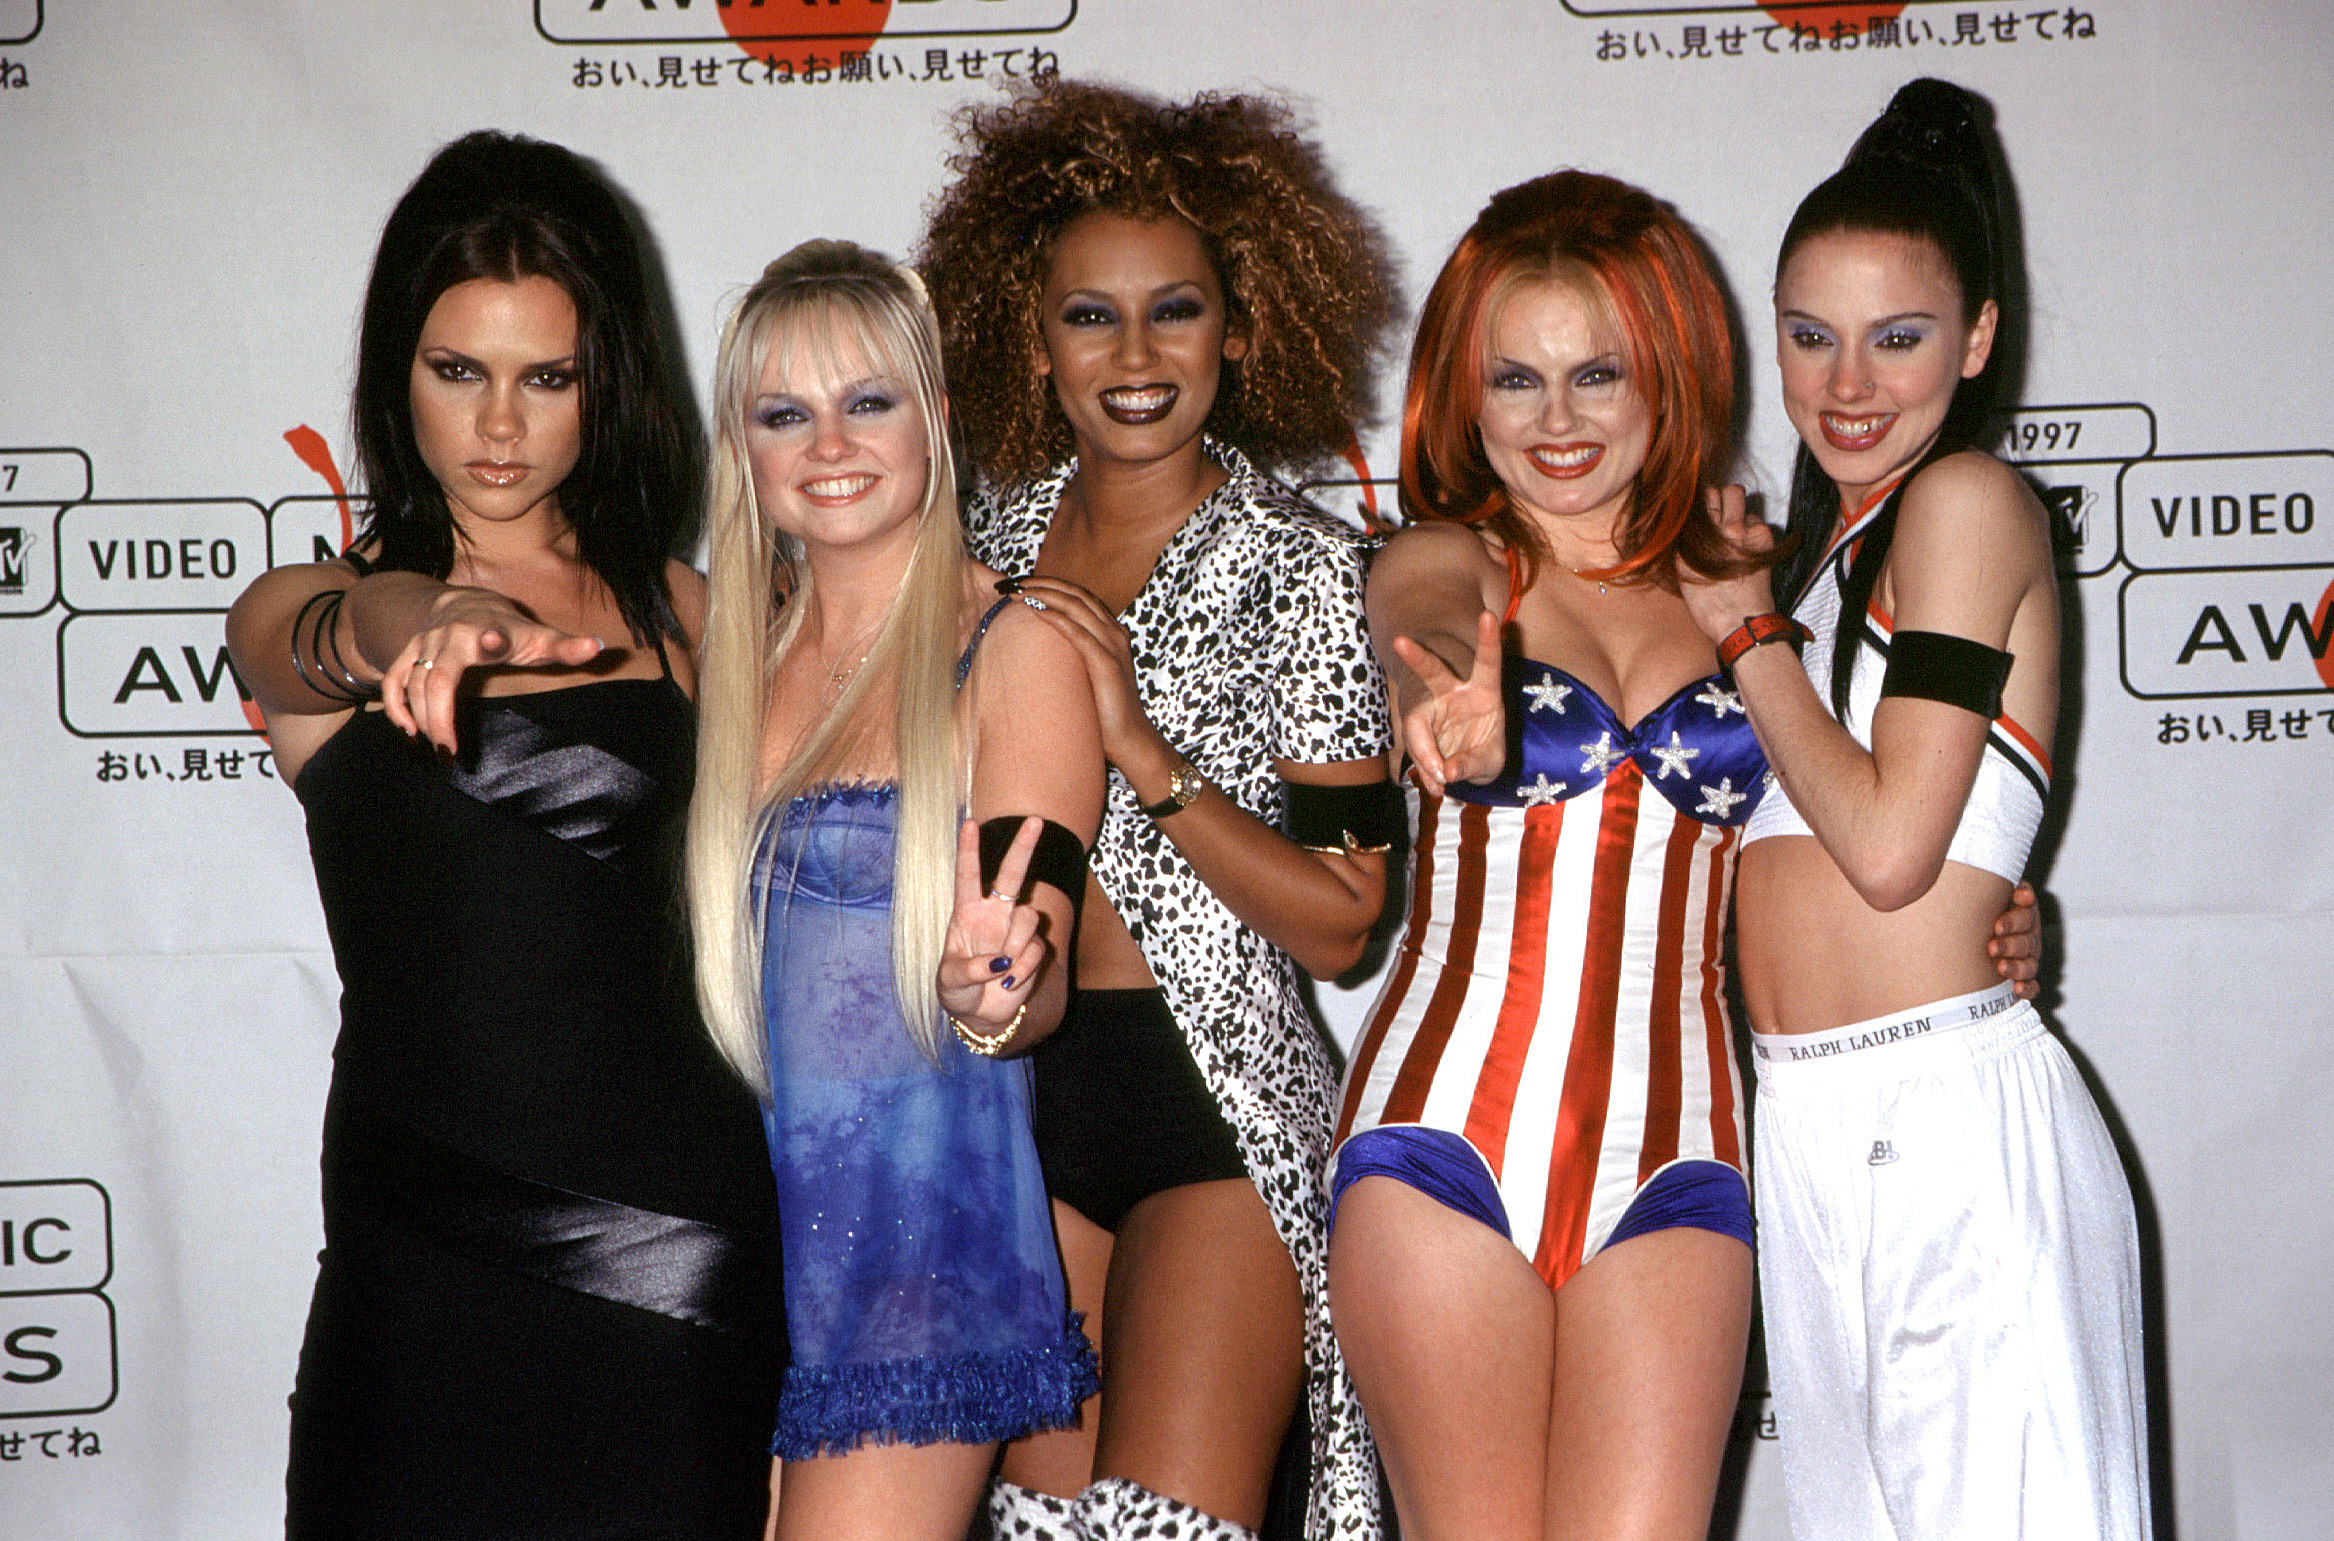 Spice Girls tour is happening and Mel B is still hopeful for Victoria Beckham return